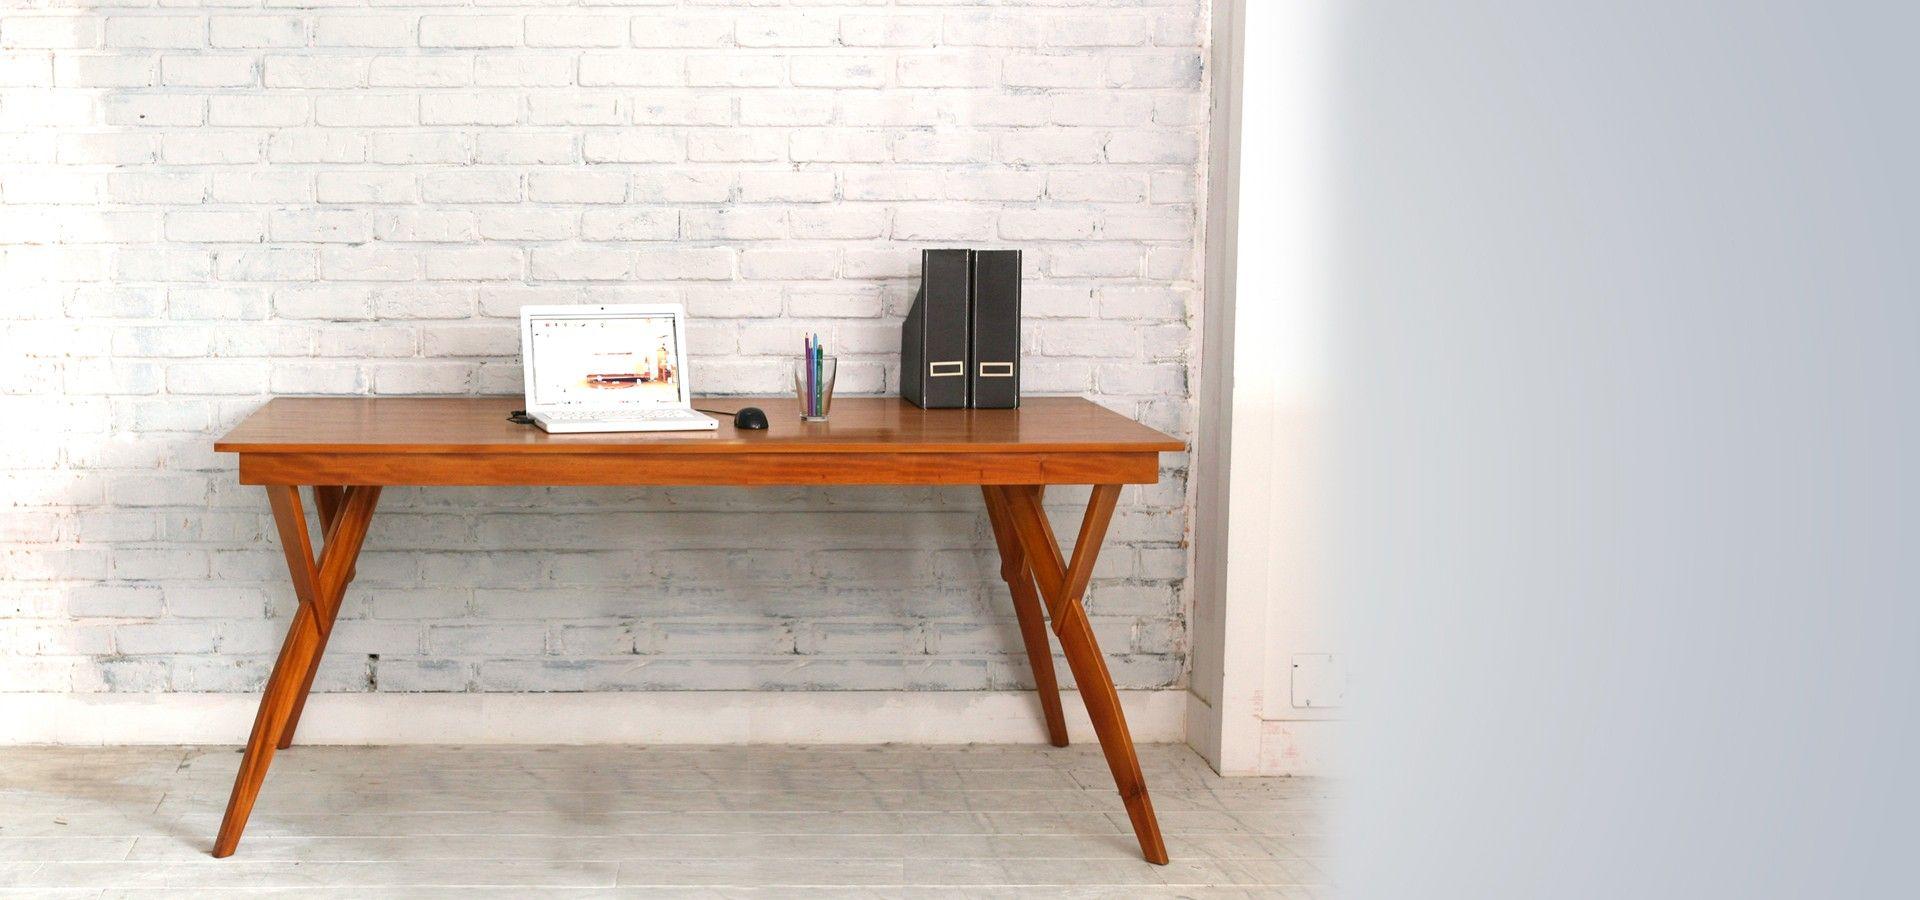 Long kitchen tables  Retro Dining Table Long  Seater  Home decor  Pinterest  Retro